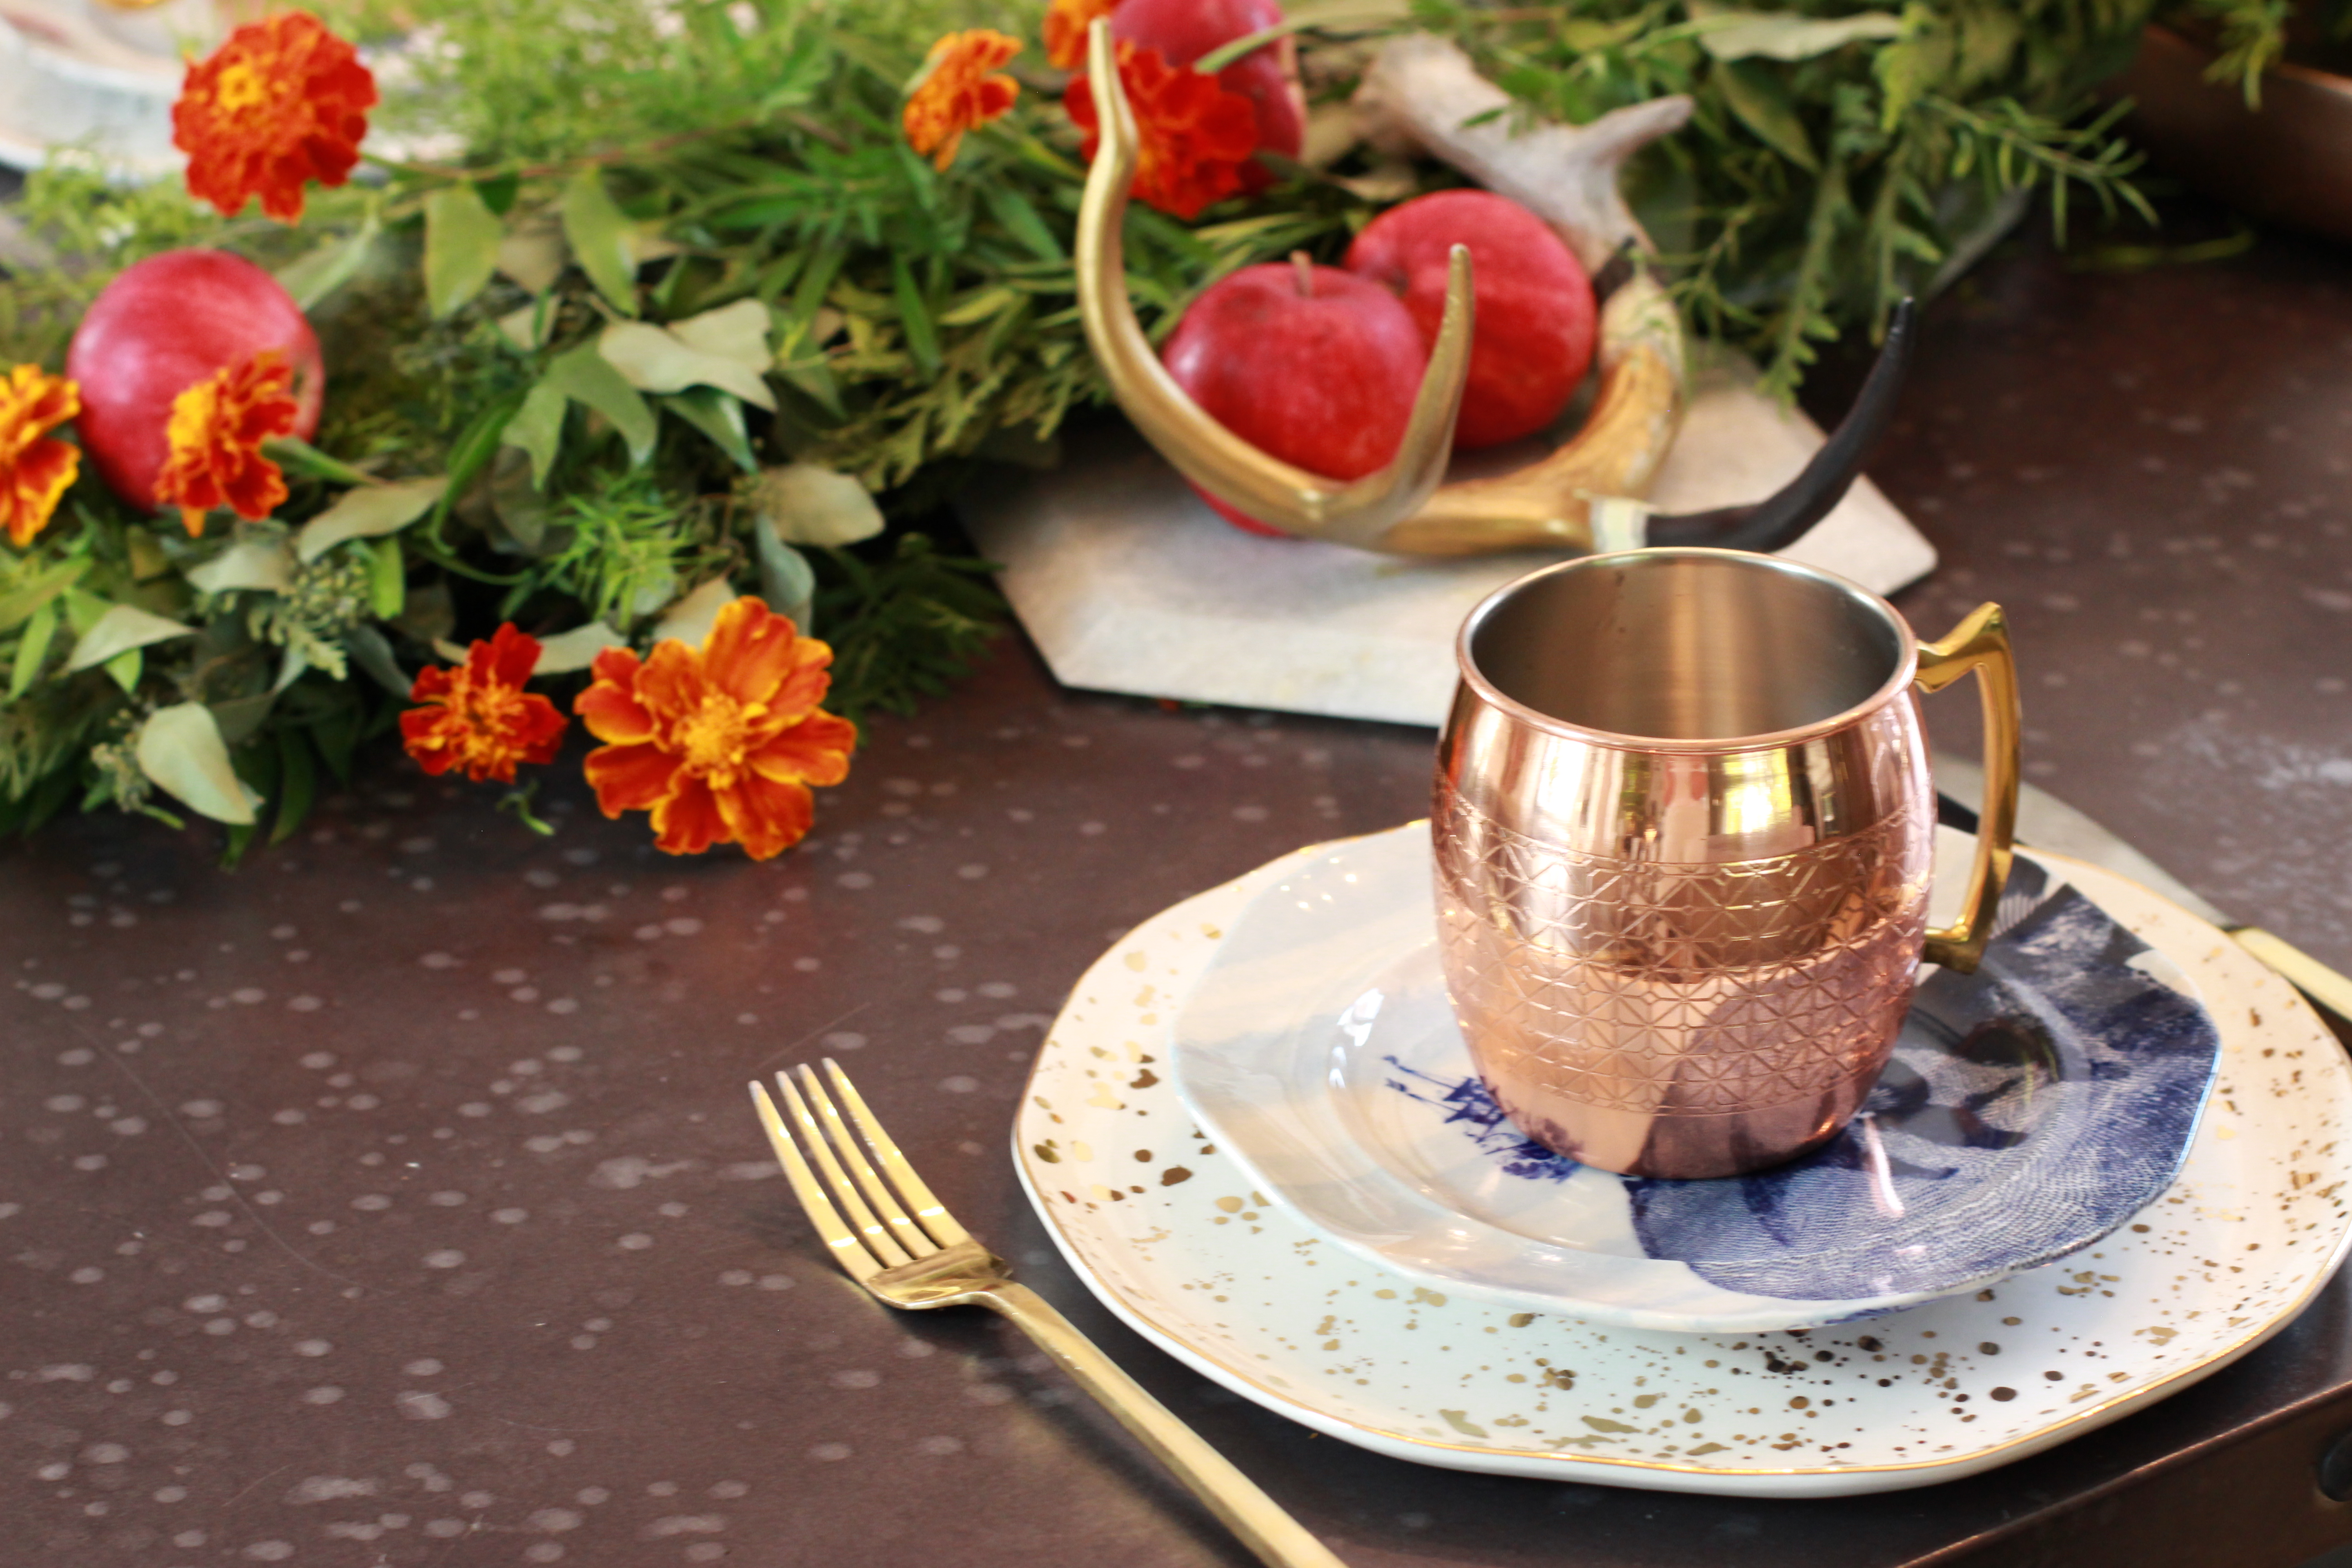 ... fall table setting tablescape home decor style apples & Home Decor #AD || All those Fall feels\u2026 || An Autumn Table Setting ...